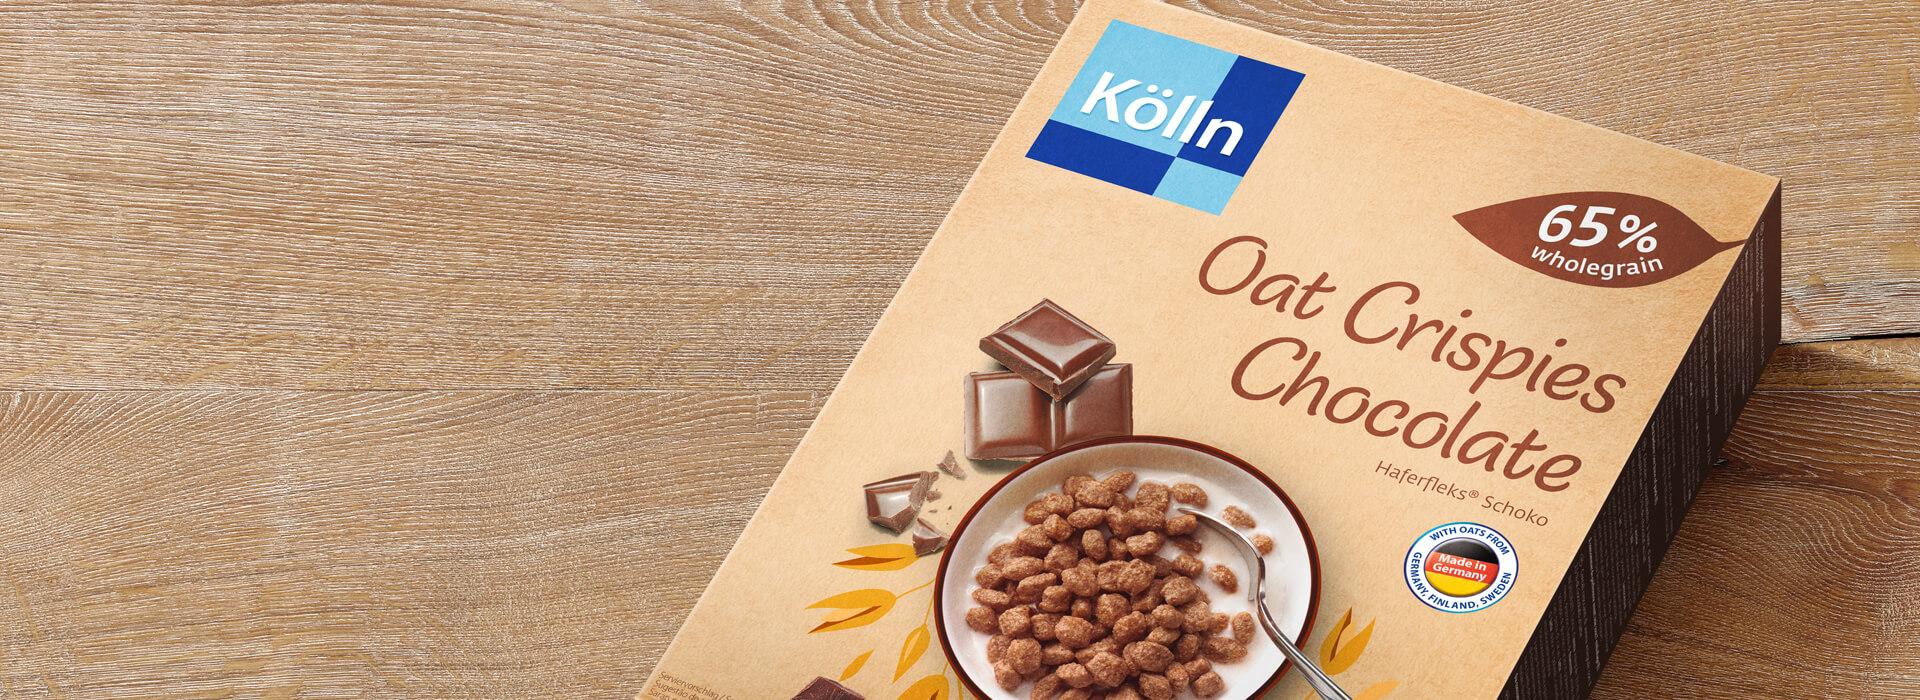 Koelln Oat Crispies Chocolate Pack on Table